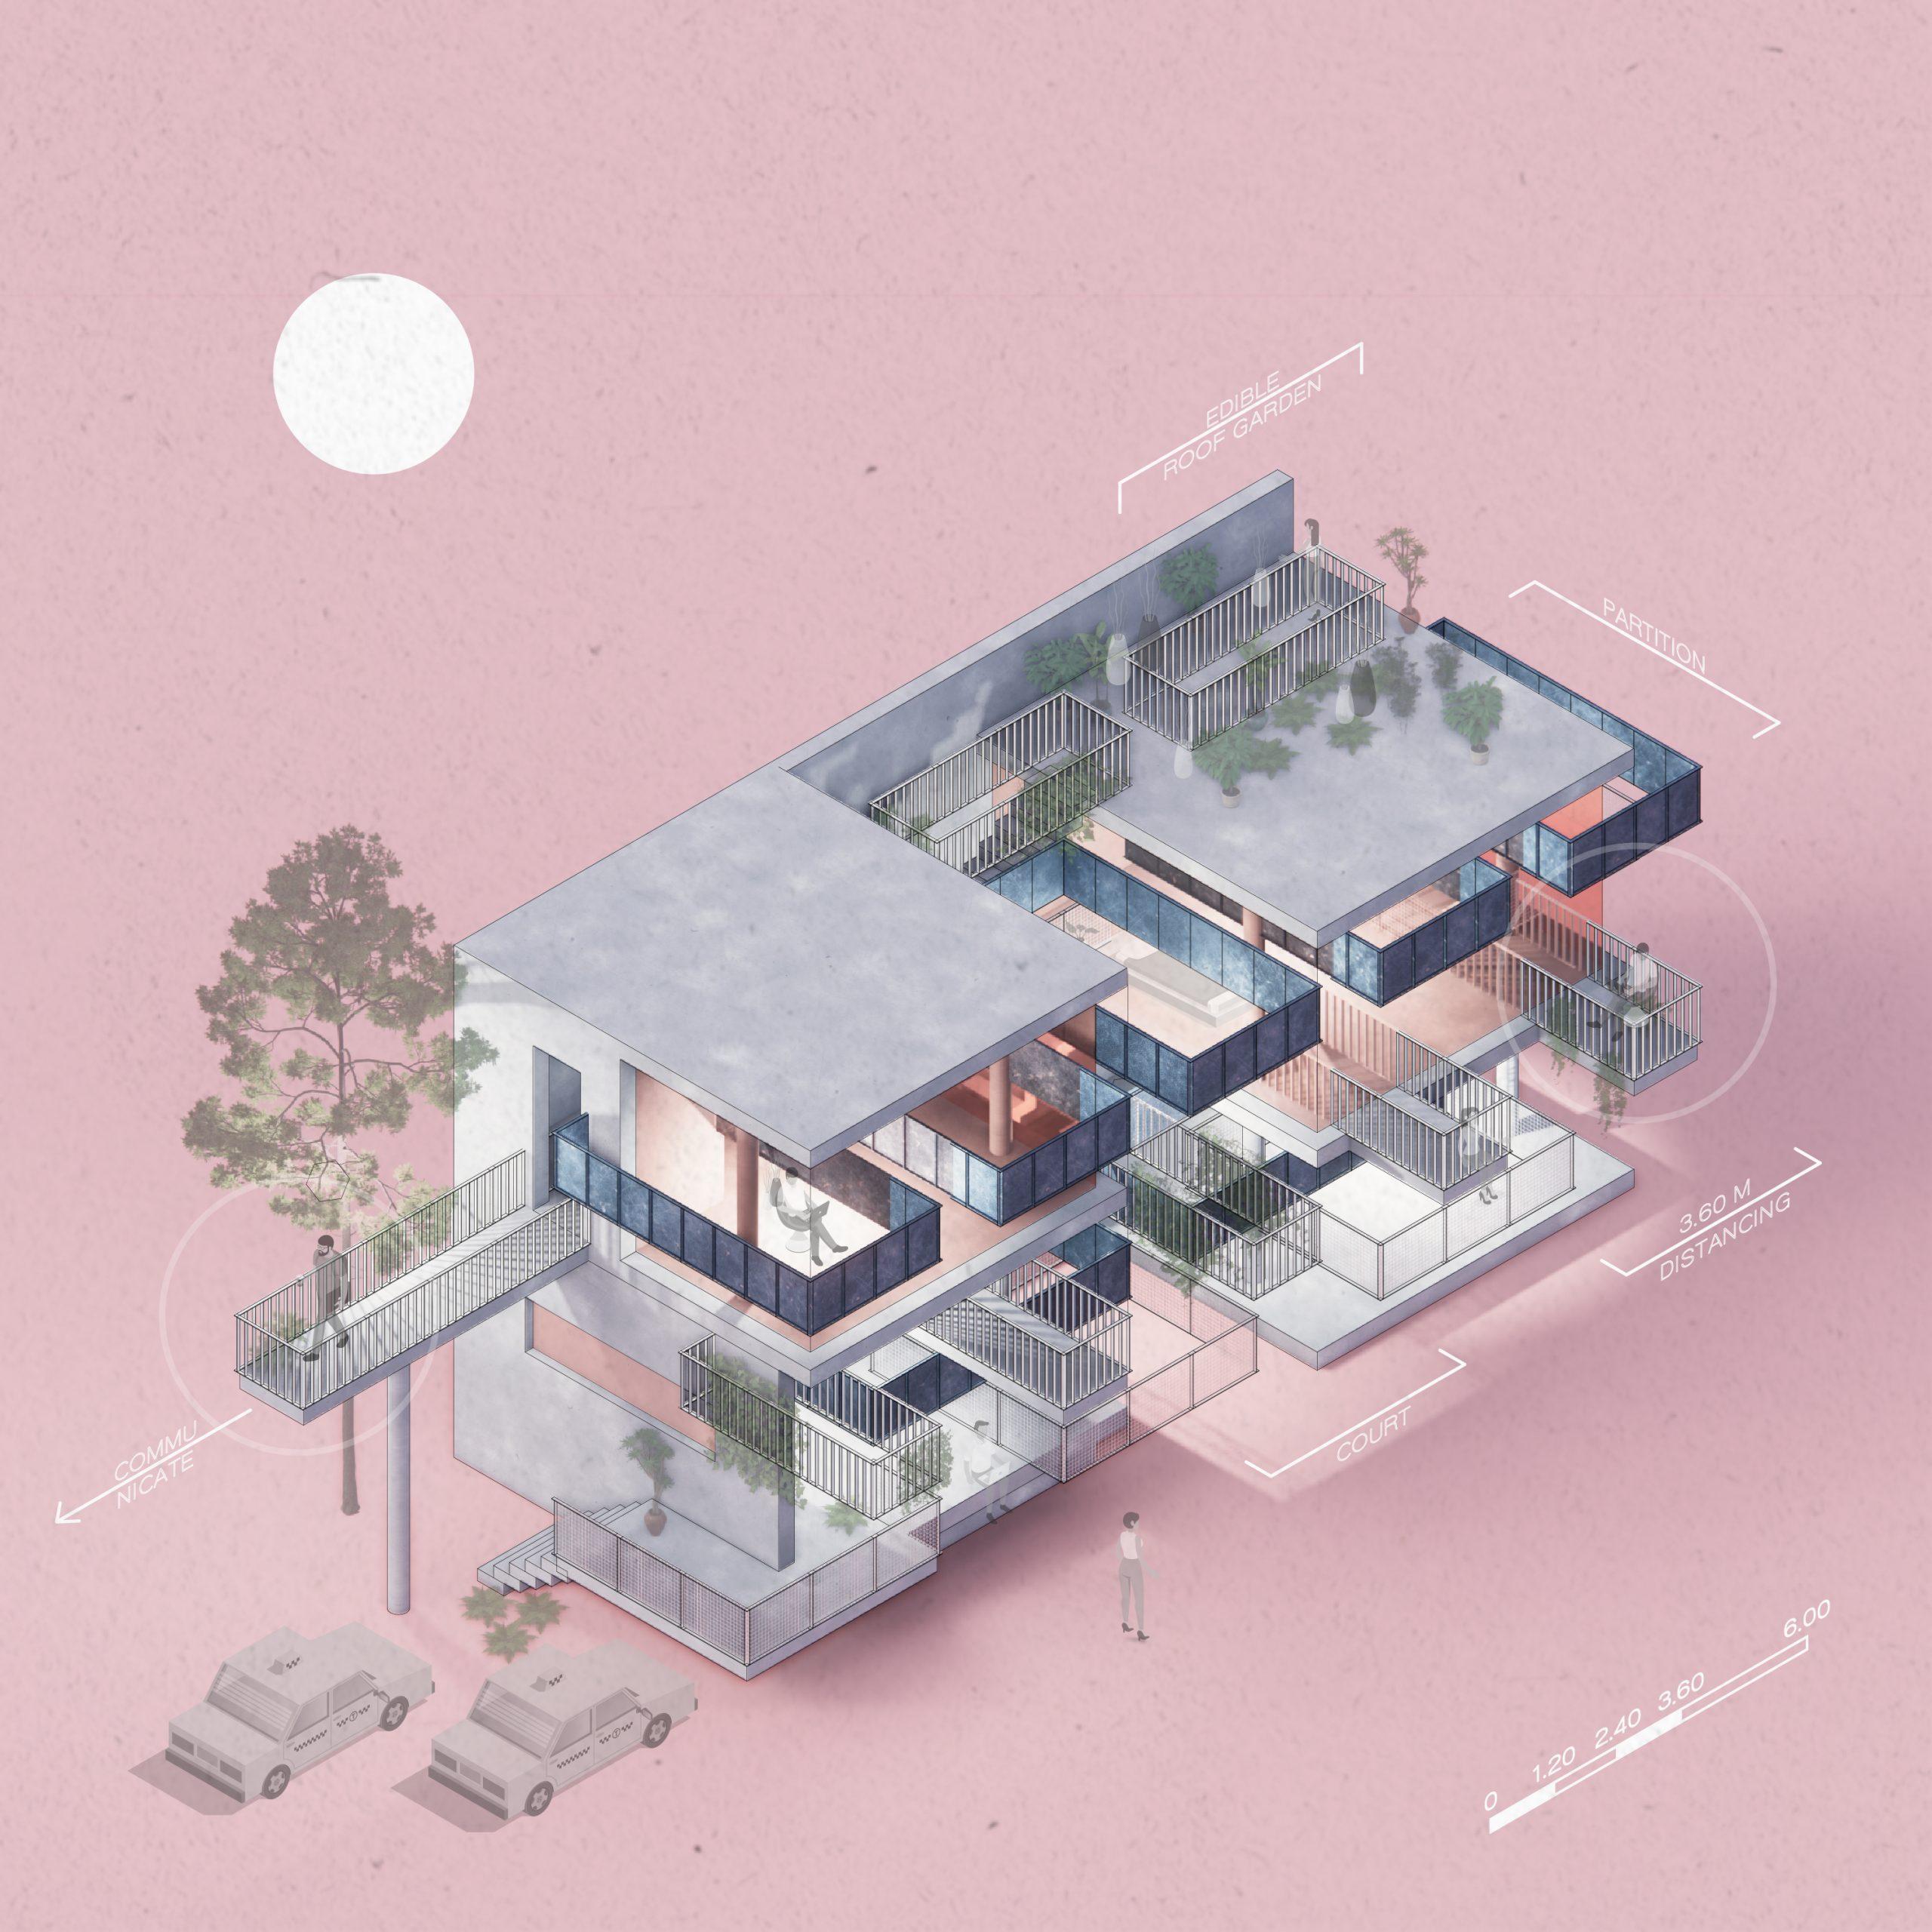 TERRACE TRACED HOUSE - by Thadtham Semaeakarat